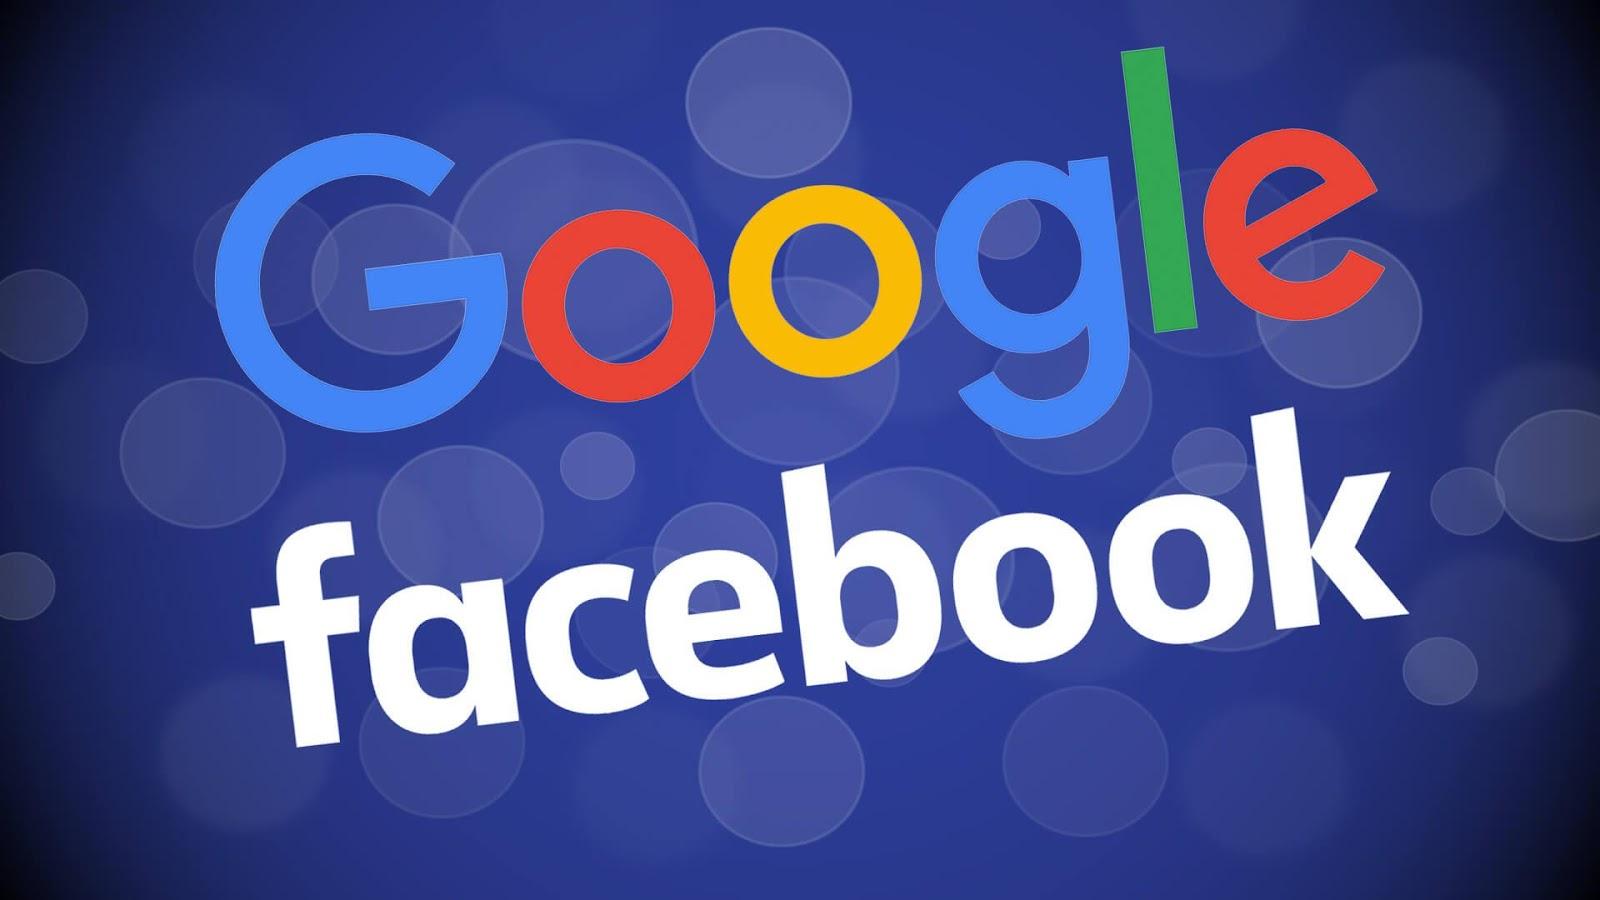 Nga phạt Google, Facebook - VnExpress Số hóa